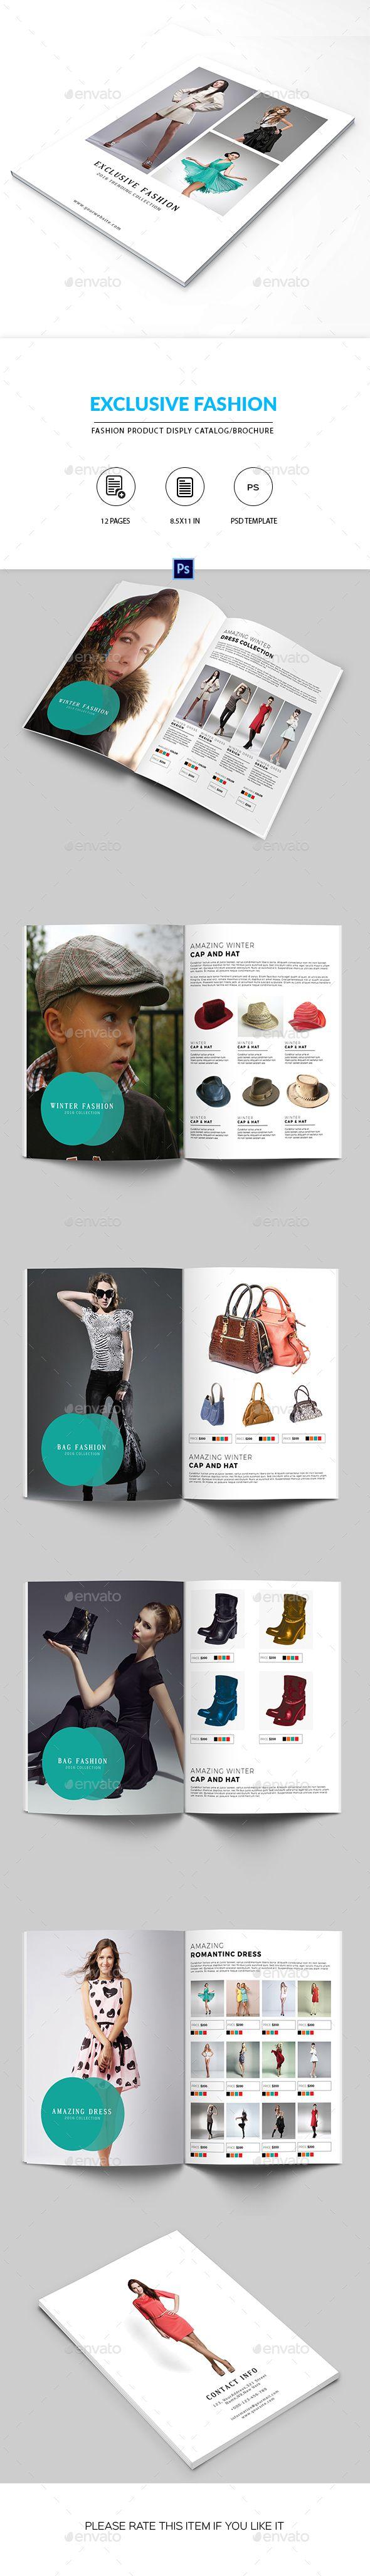 Minimal Fashion Product Display Brochure/Catalog  #lookbook #minimal #photoshop #price #product #$12